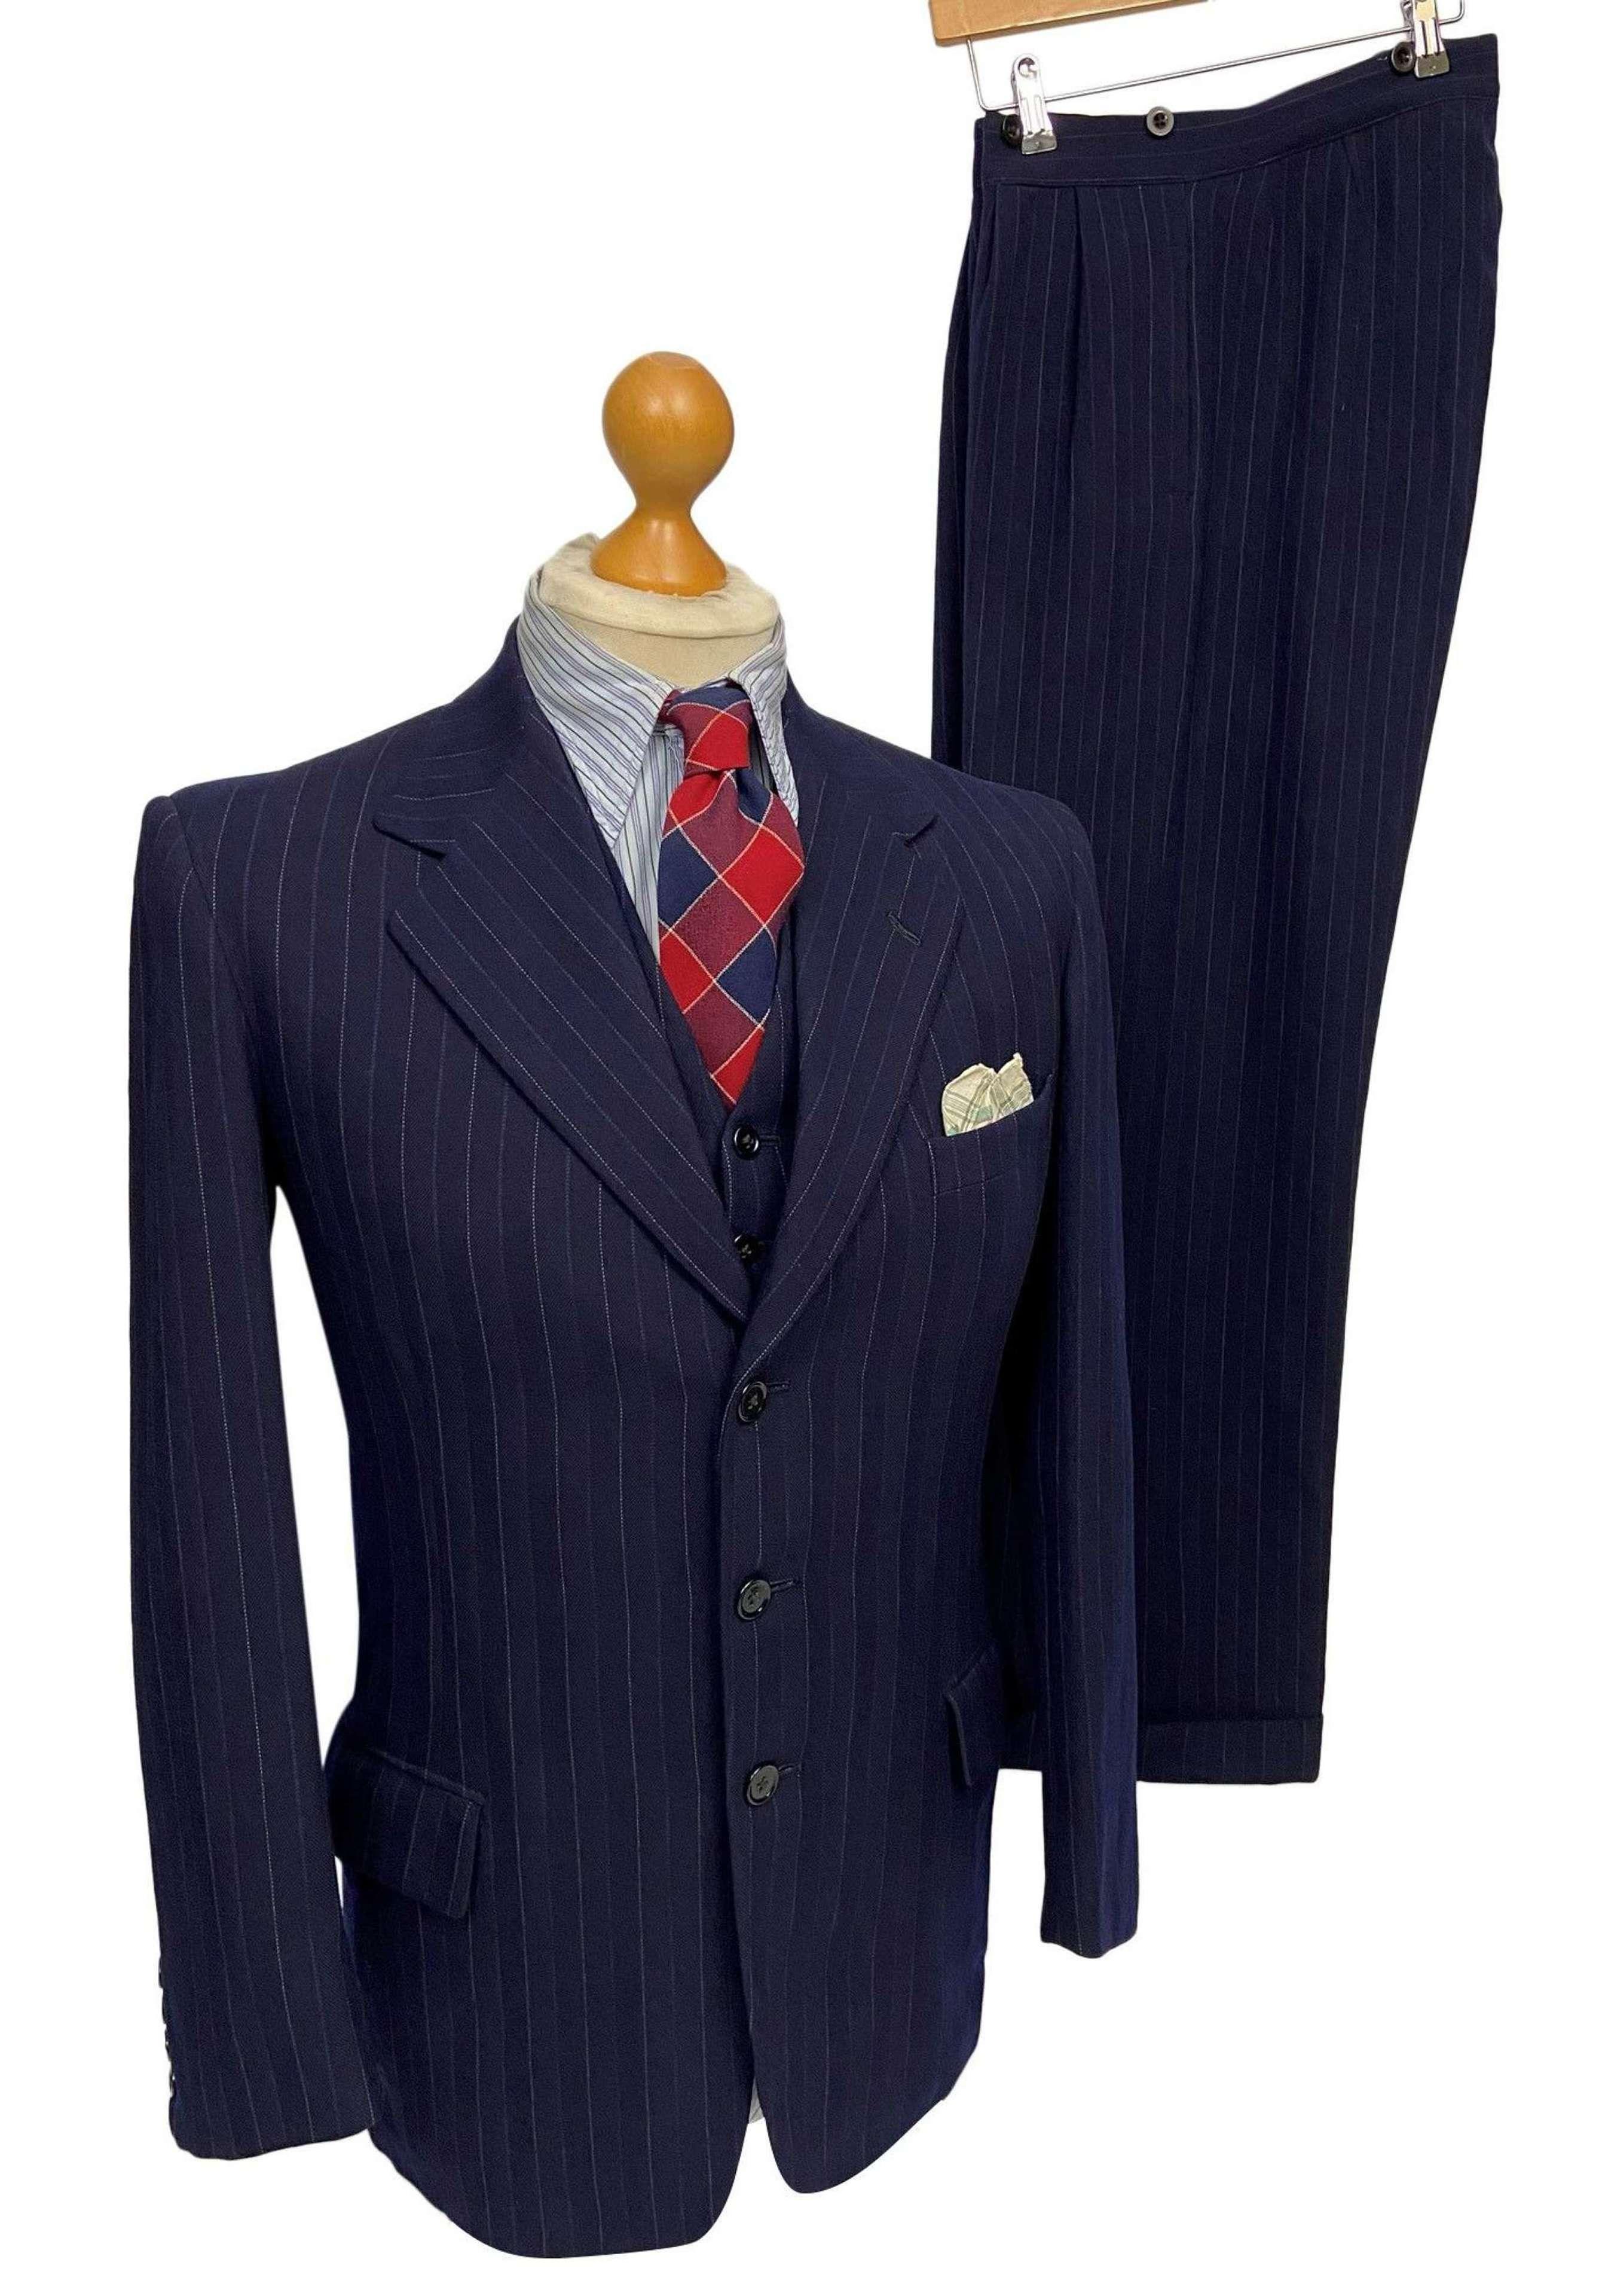 Original 1940s CC41 3 Piece Blue Pinstripe Suit by 'Arthur Gledhill'